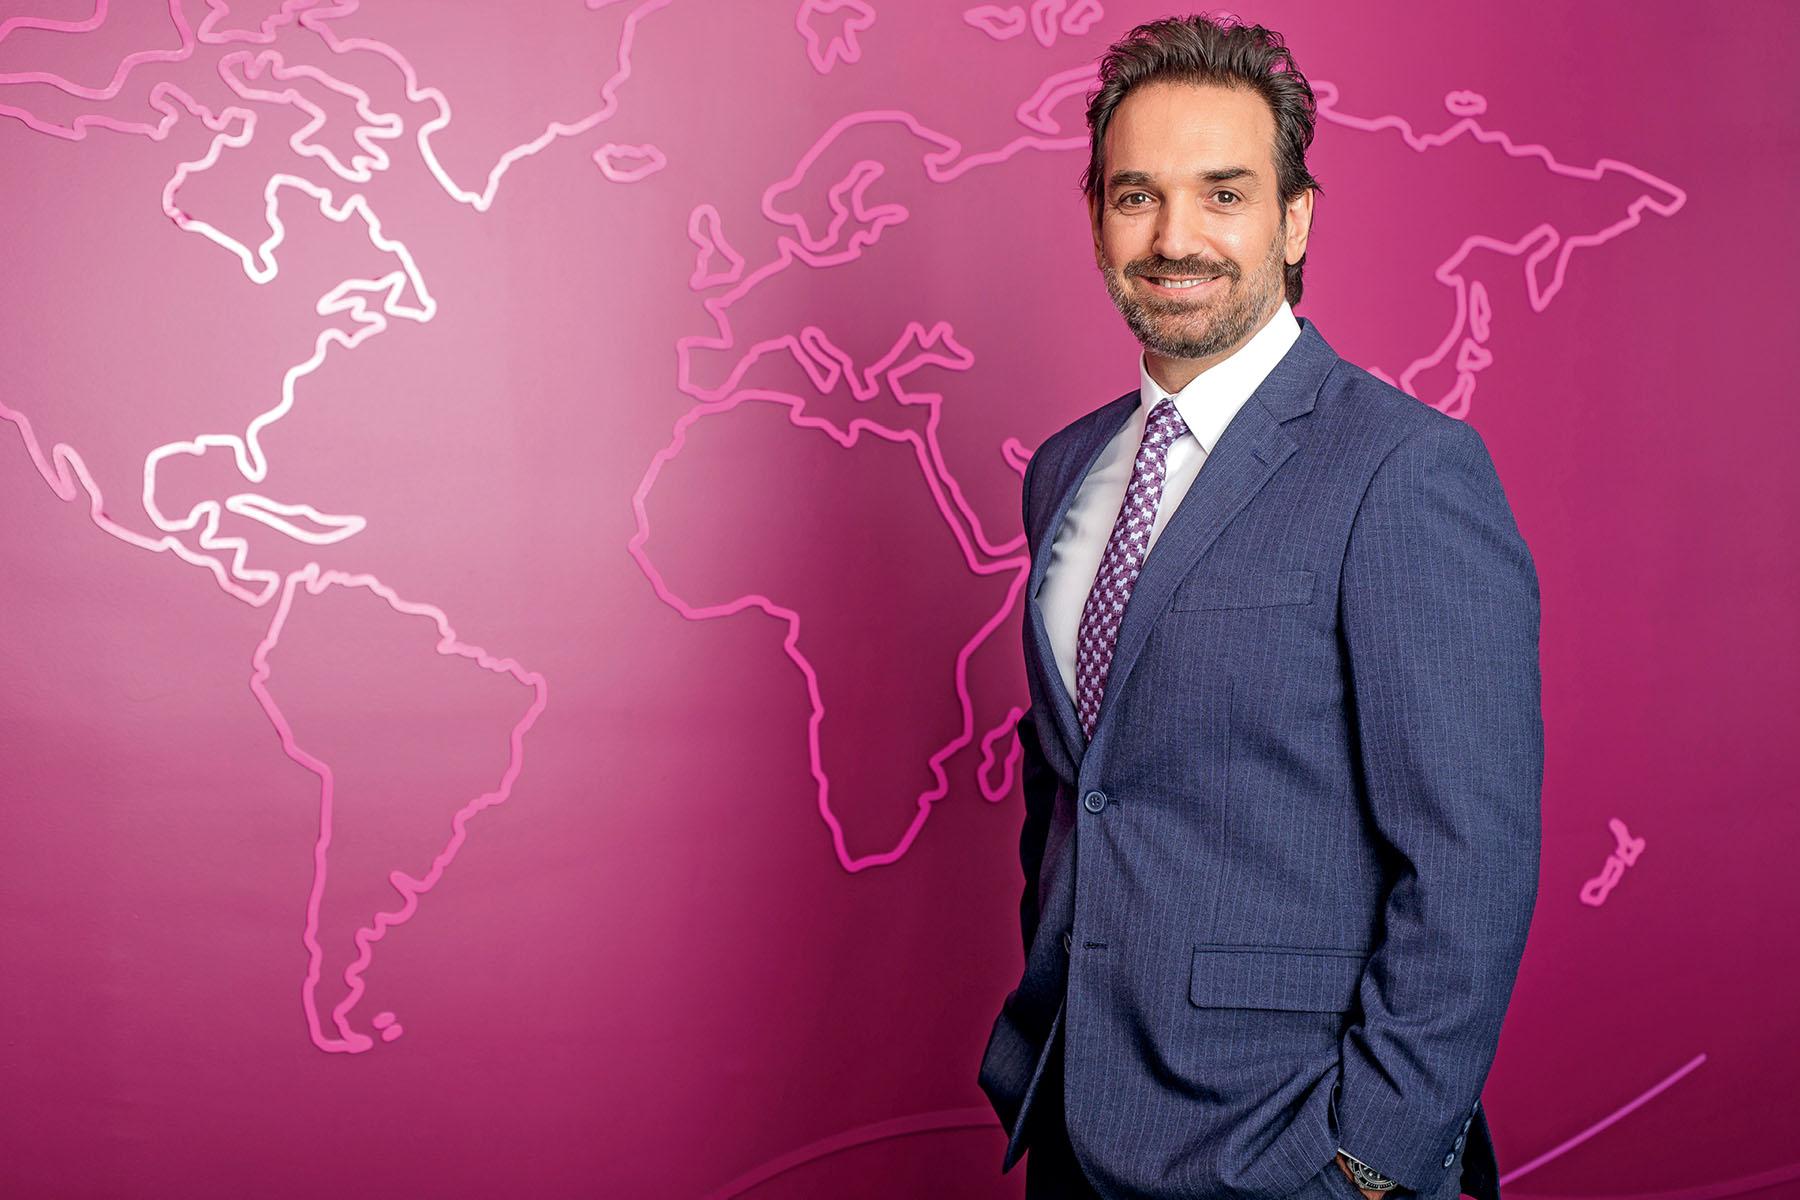 Sebastián Bagó, General Director of Grupo Empresarial Bagó